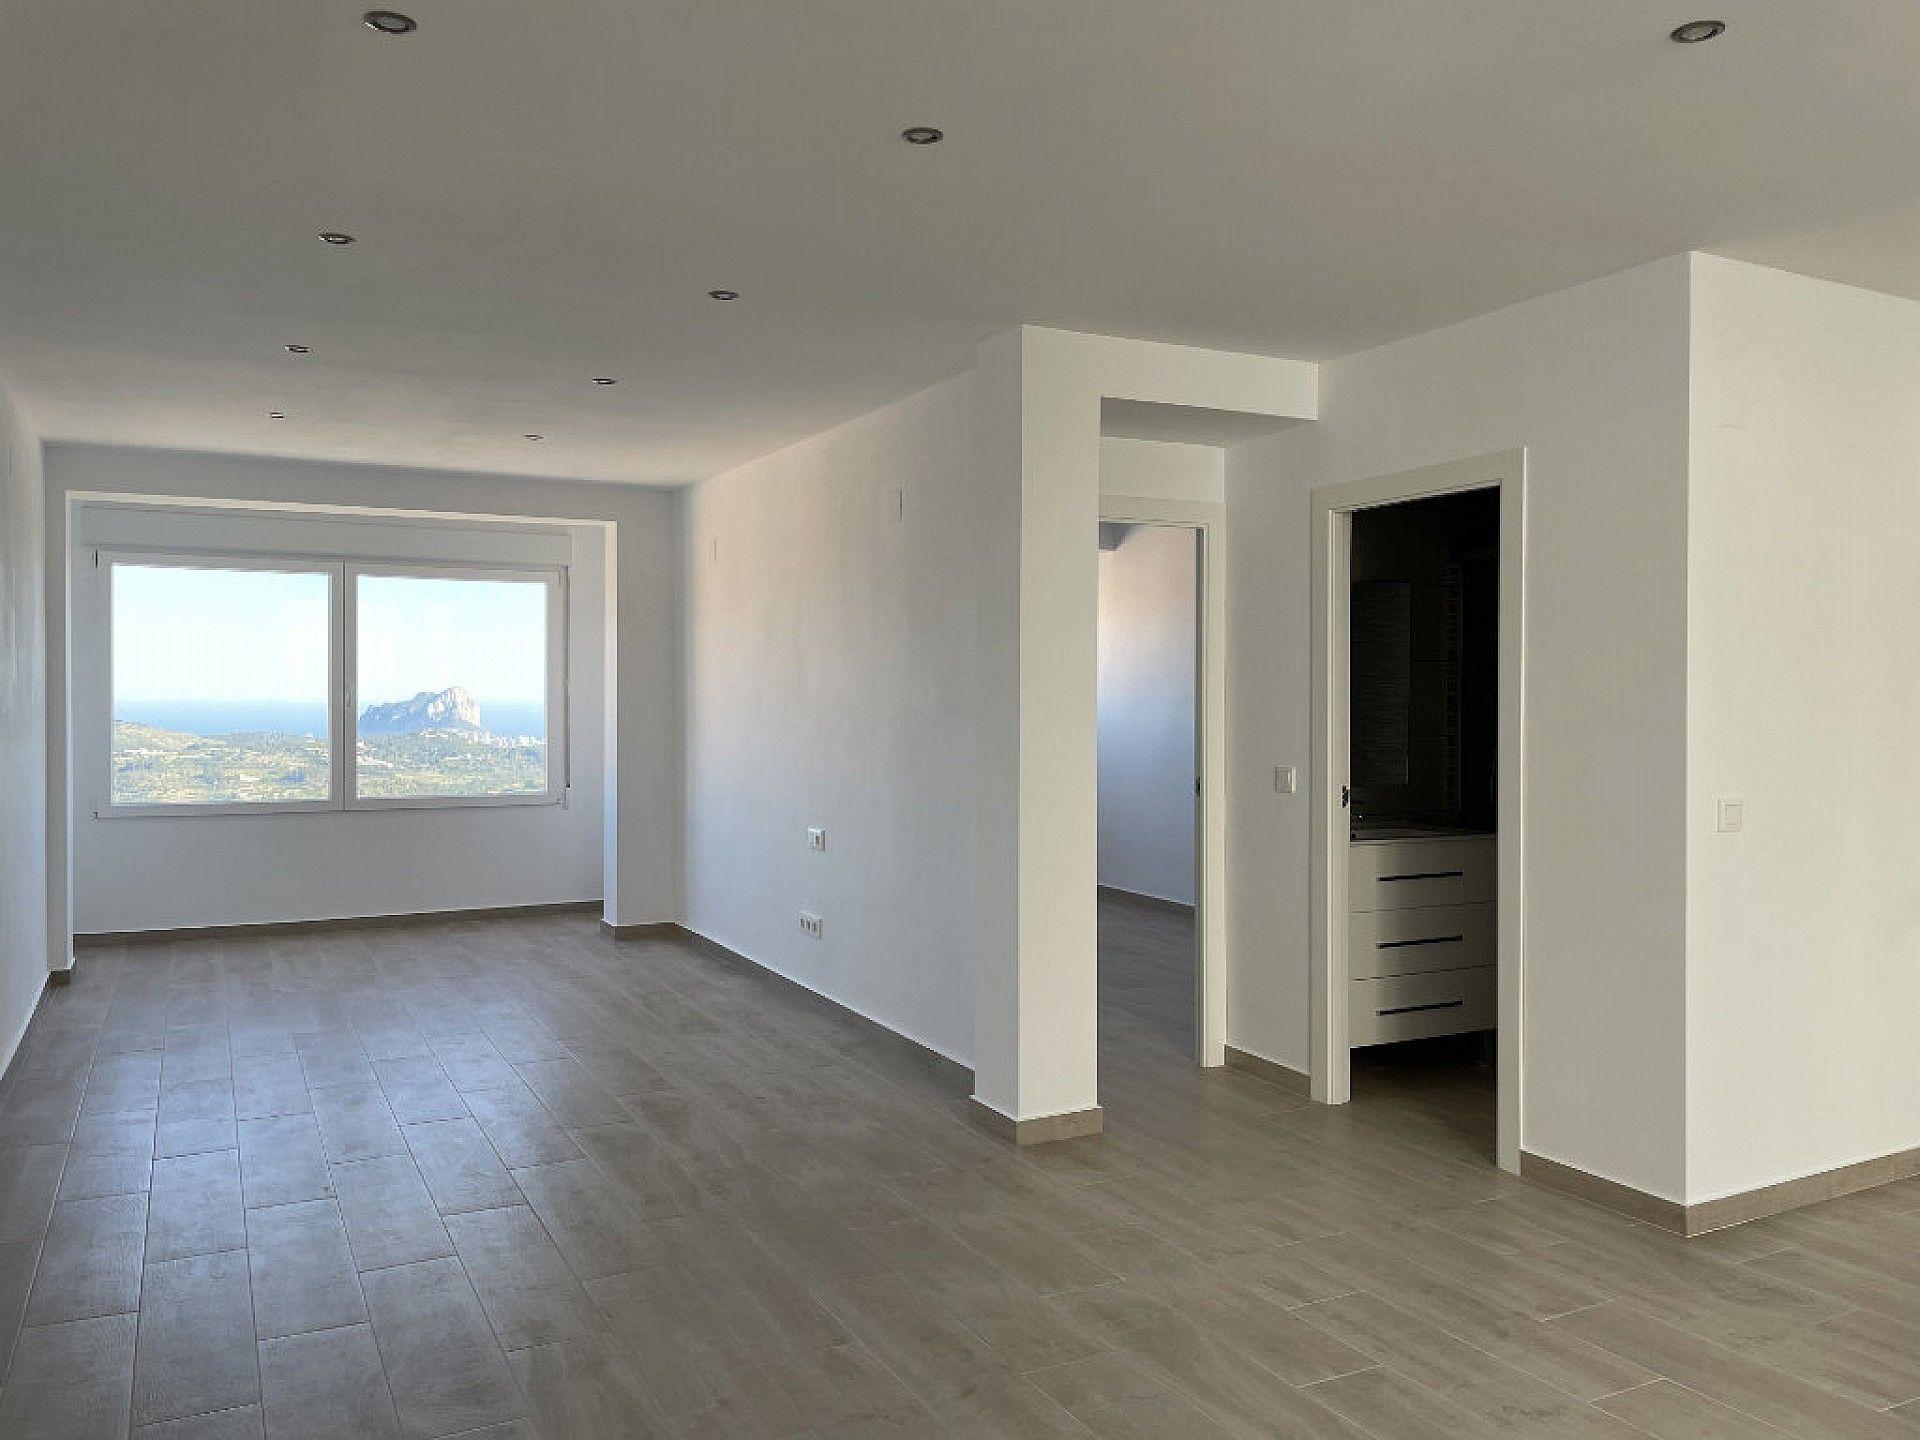 w_appartement-te-koop-costa-blanca-benissa-spanje-a1018-014-4.jpg